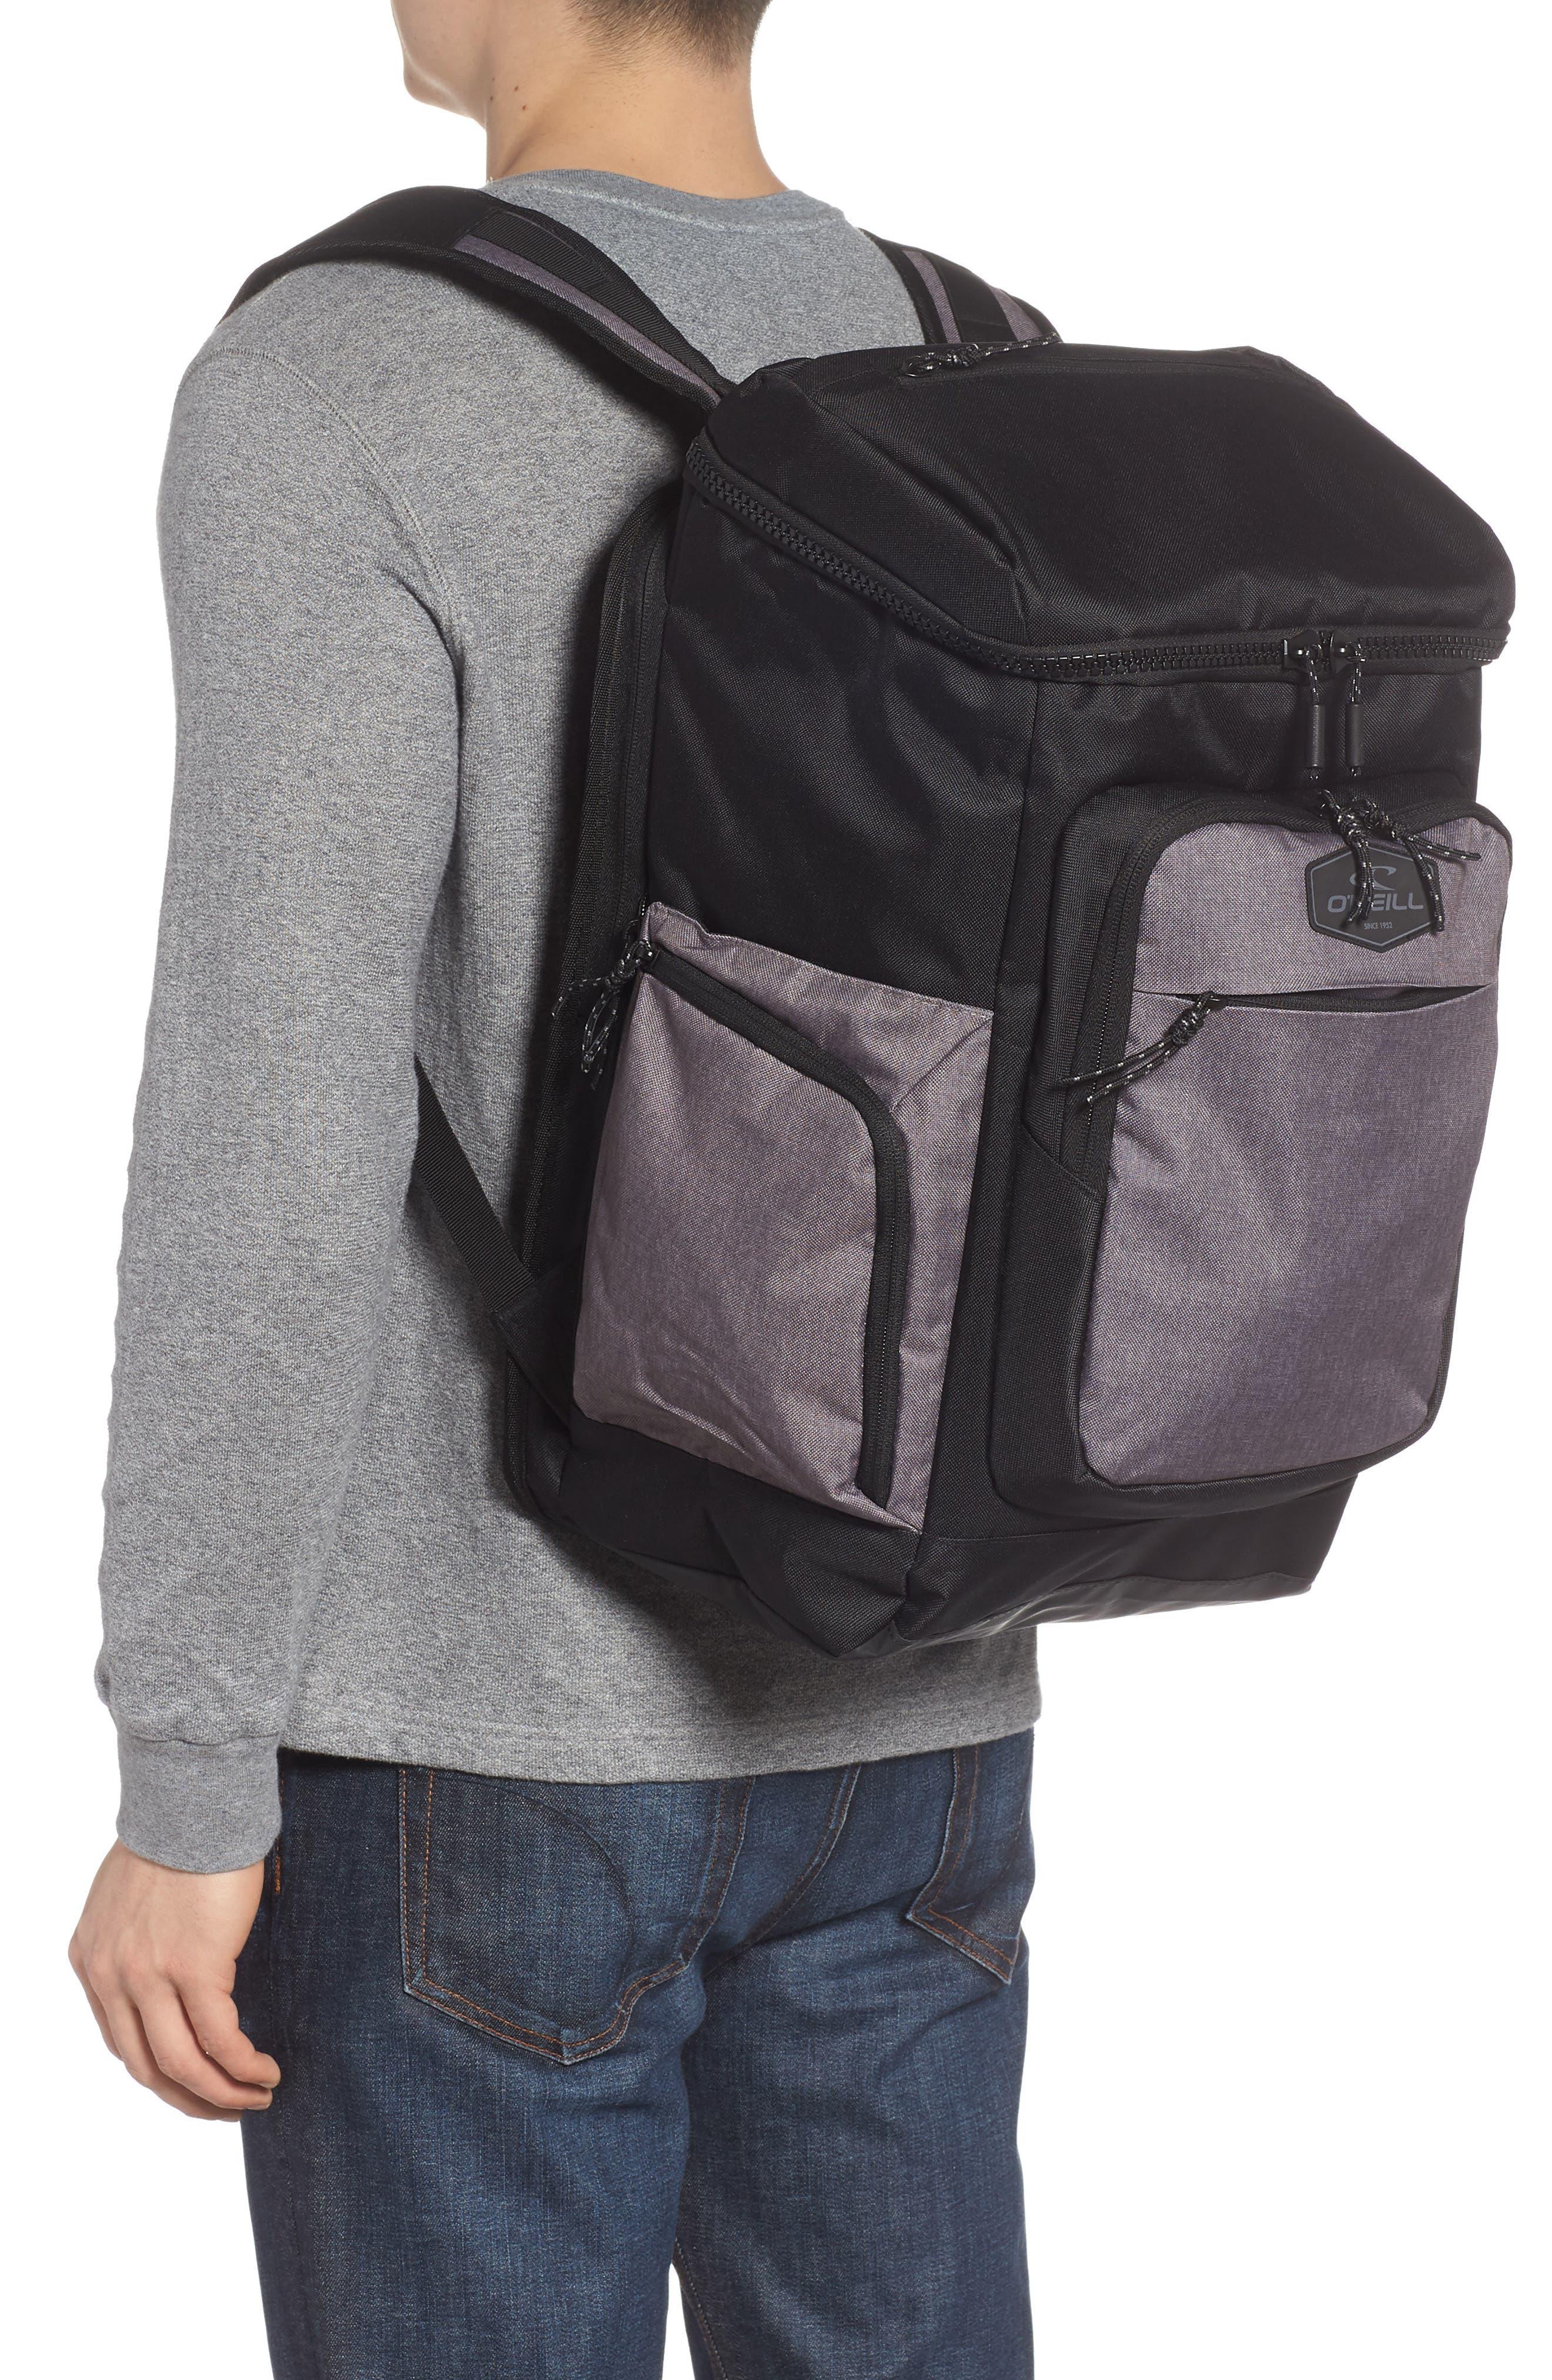 Quest Backpack,                             Alternate thumbnail 2, color,                             BLACK